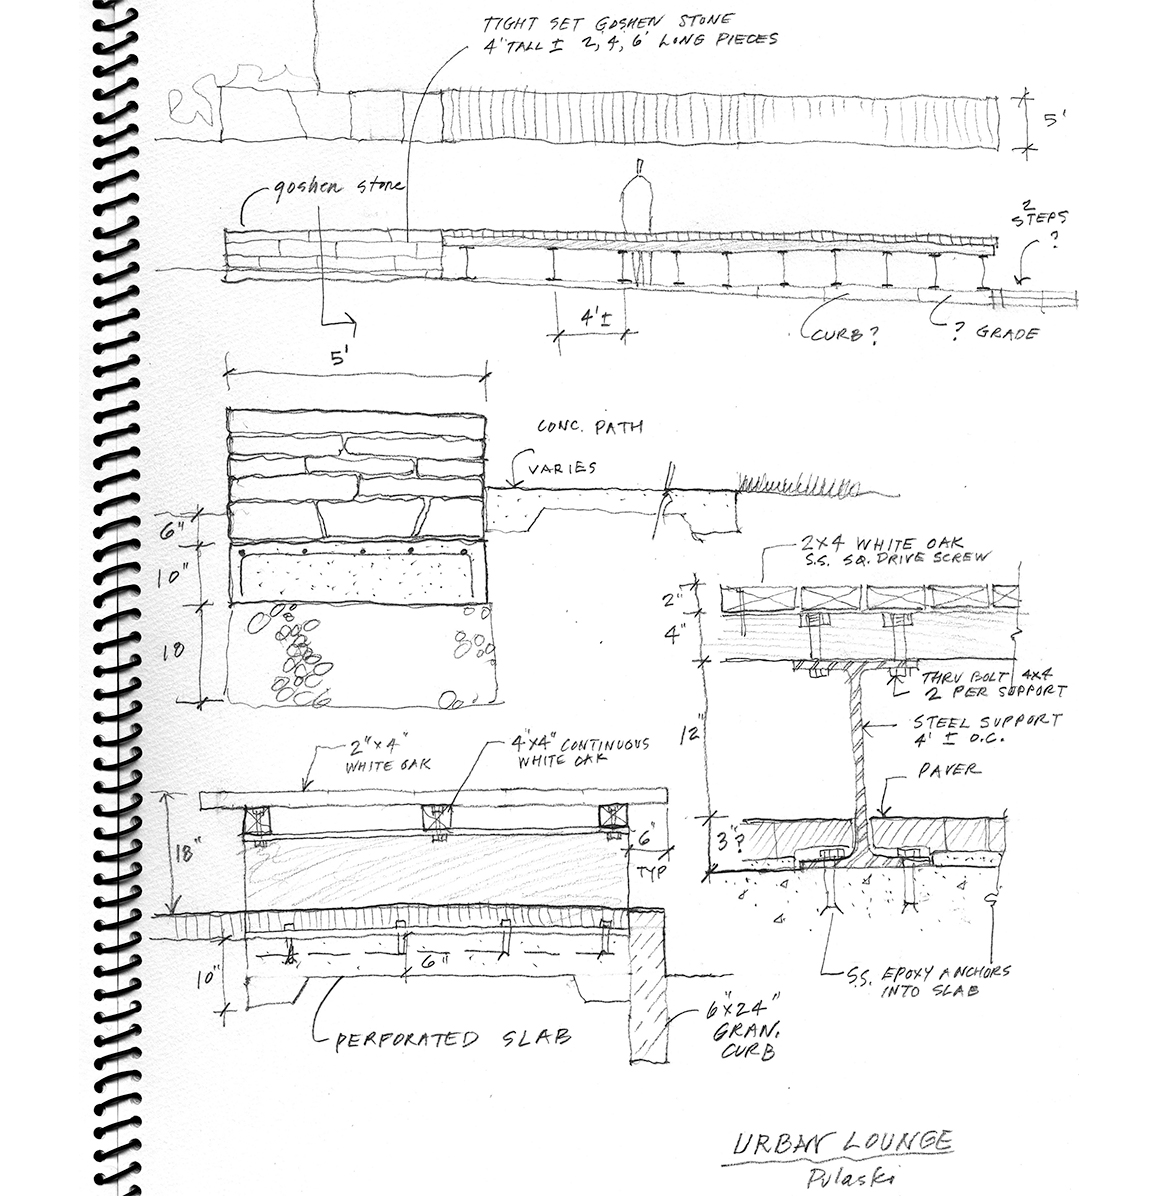 section023_pulaski-squashed.jpg